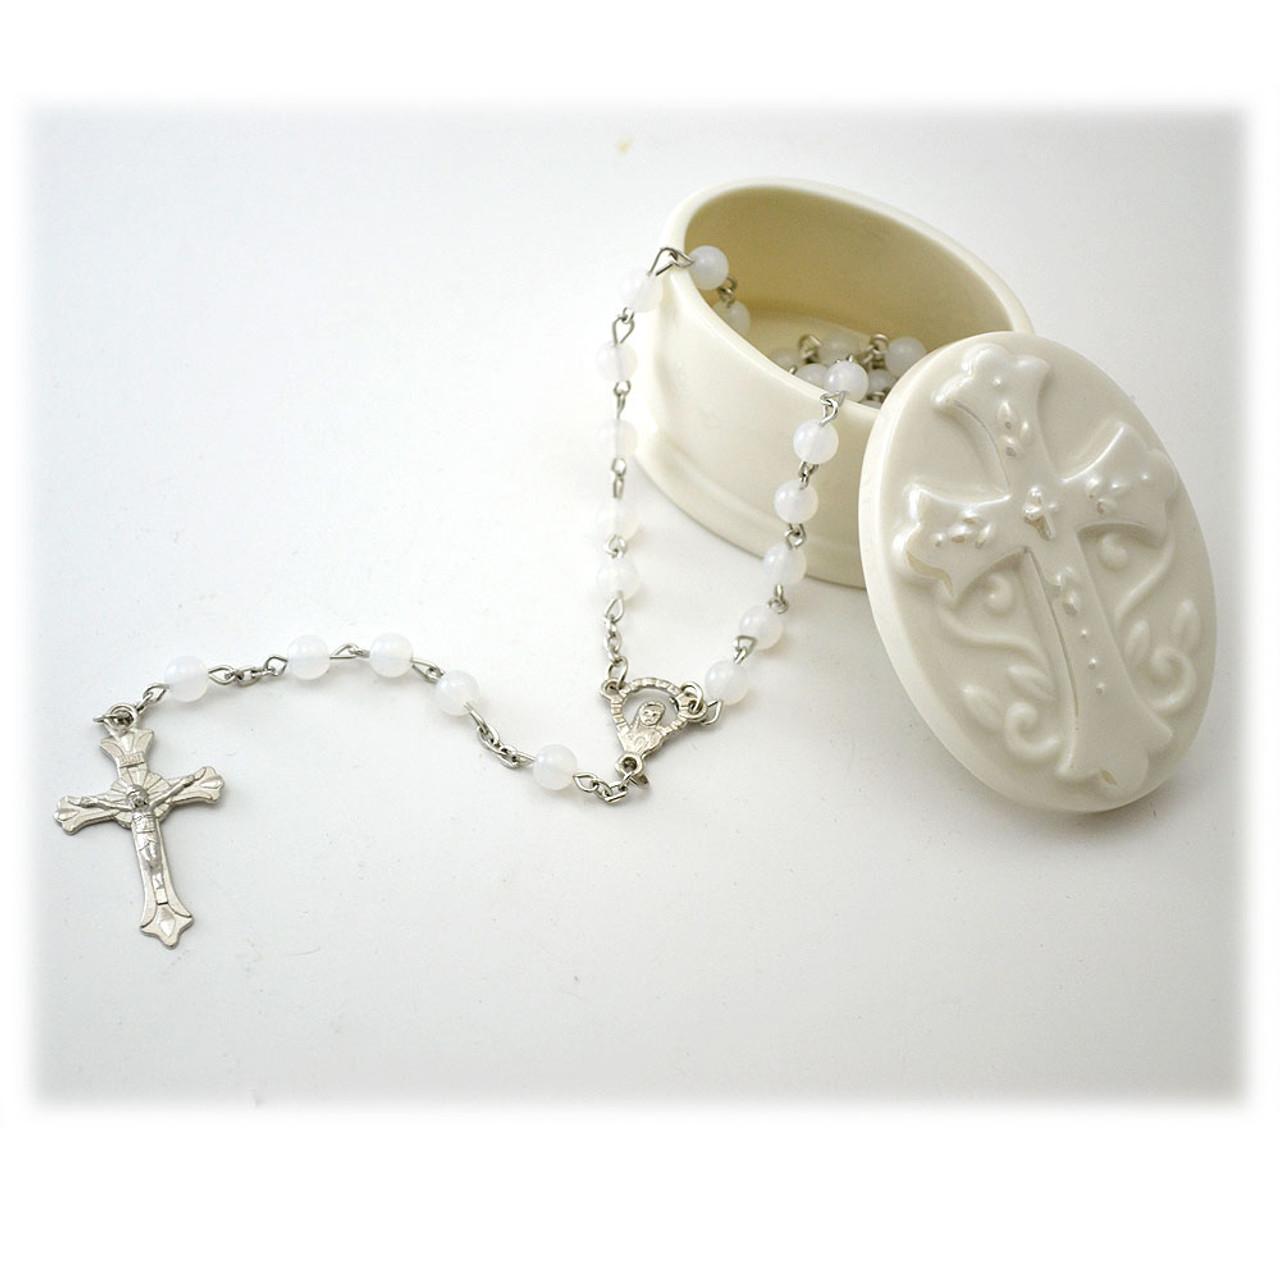 Rosary and Rosary Box